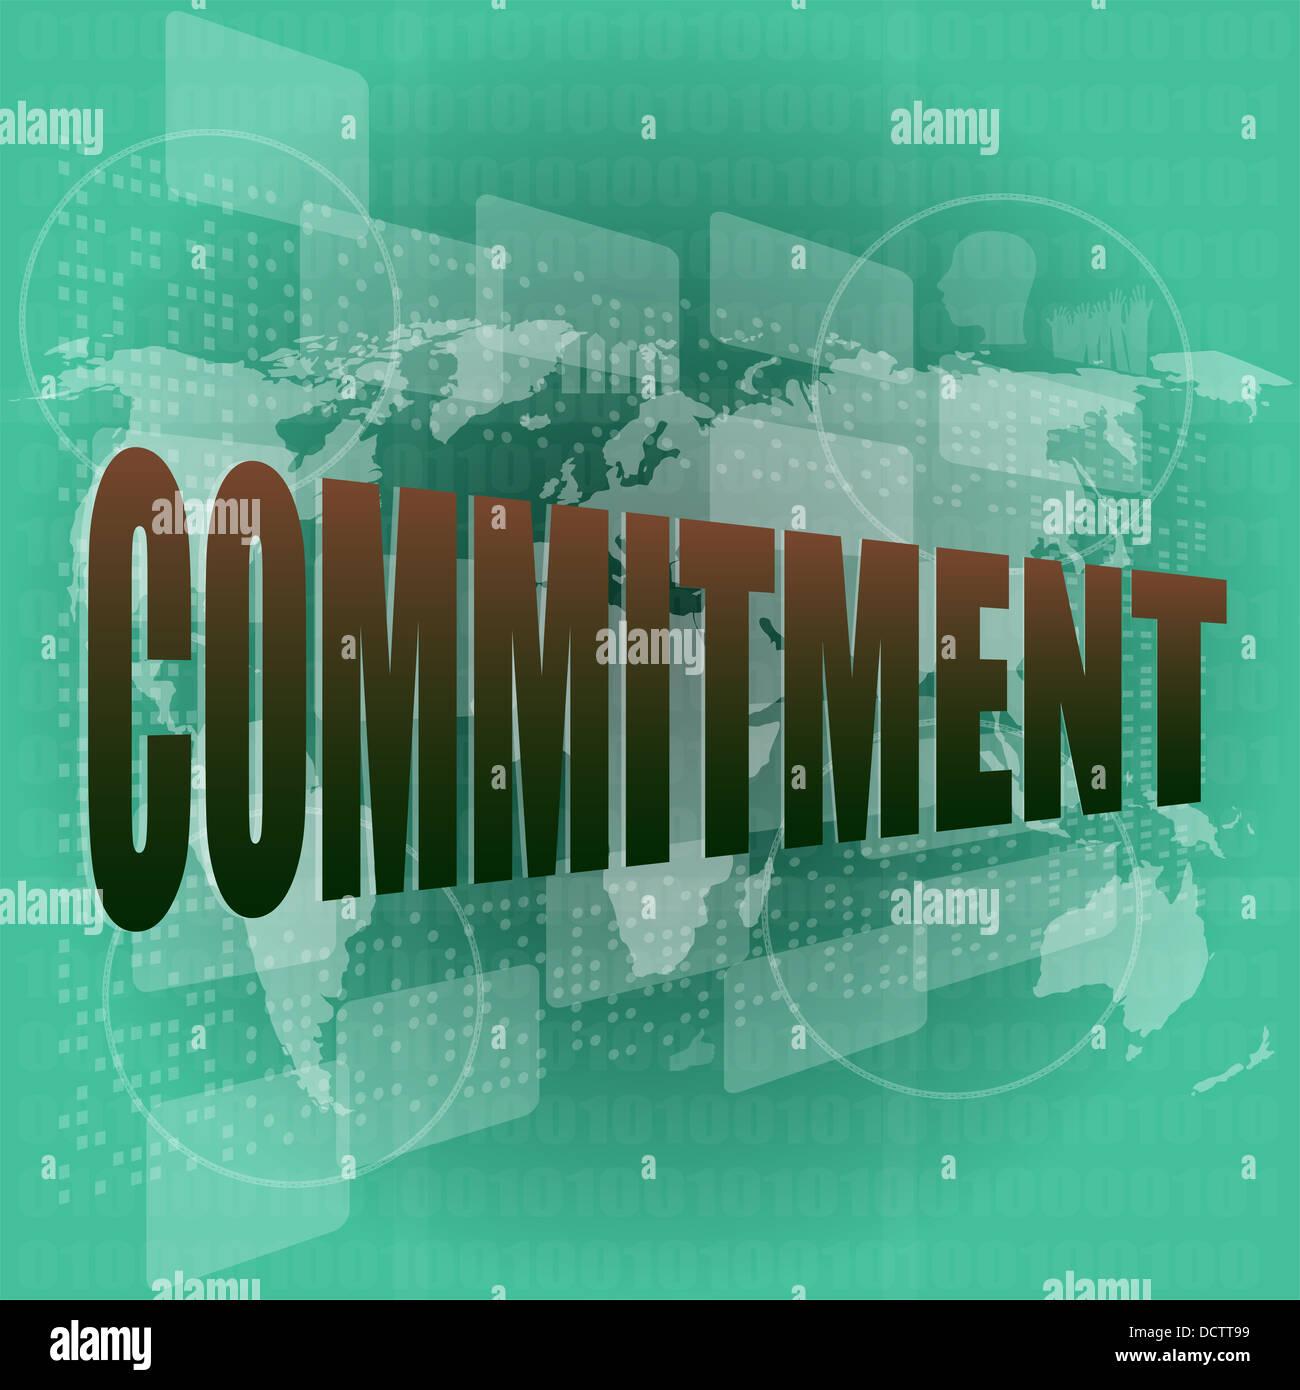 Concepto de negocio: La palabra compromiso por pantalla táctil digital Imagen De Stock